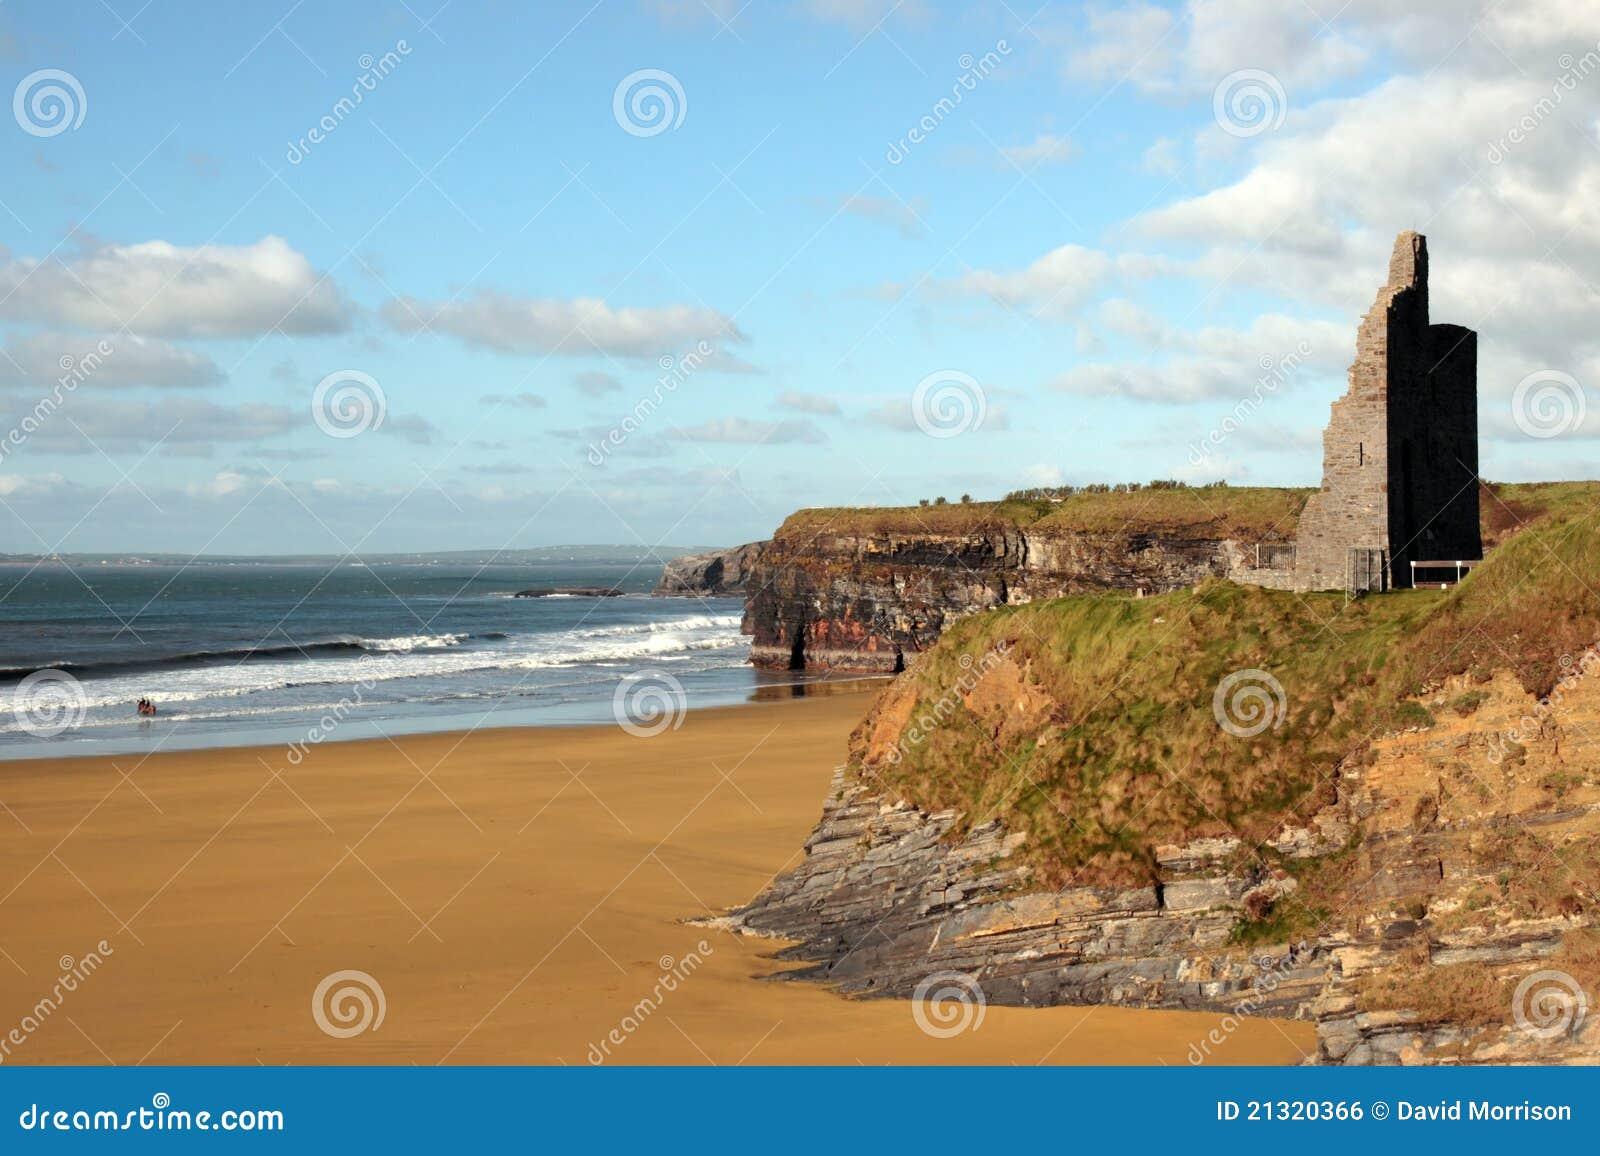 Castle ruins on cliffs above beautiful beach